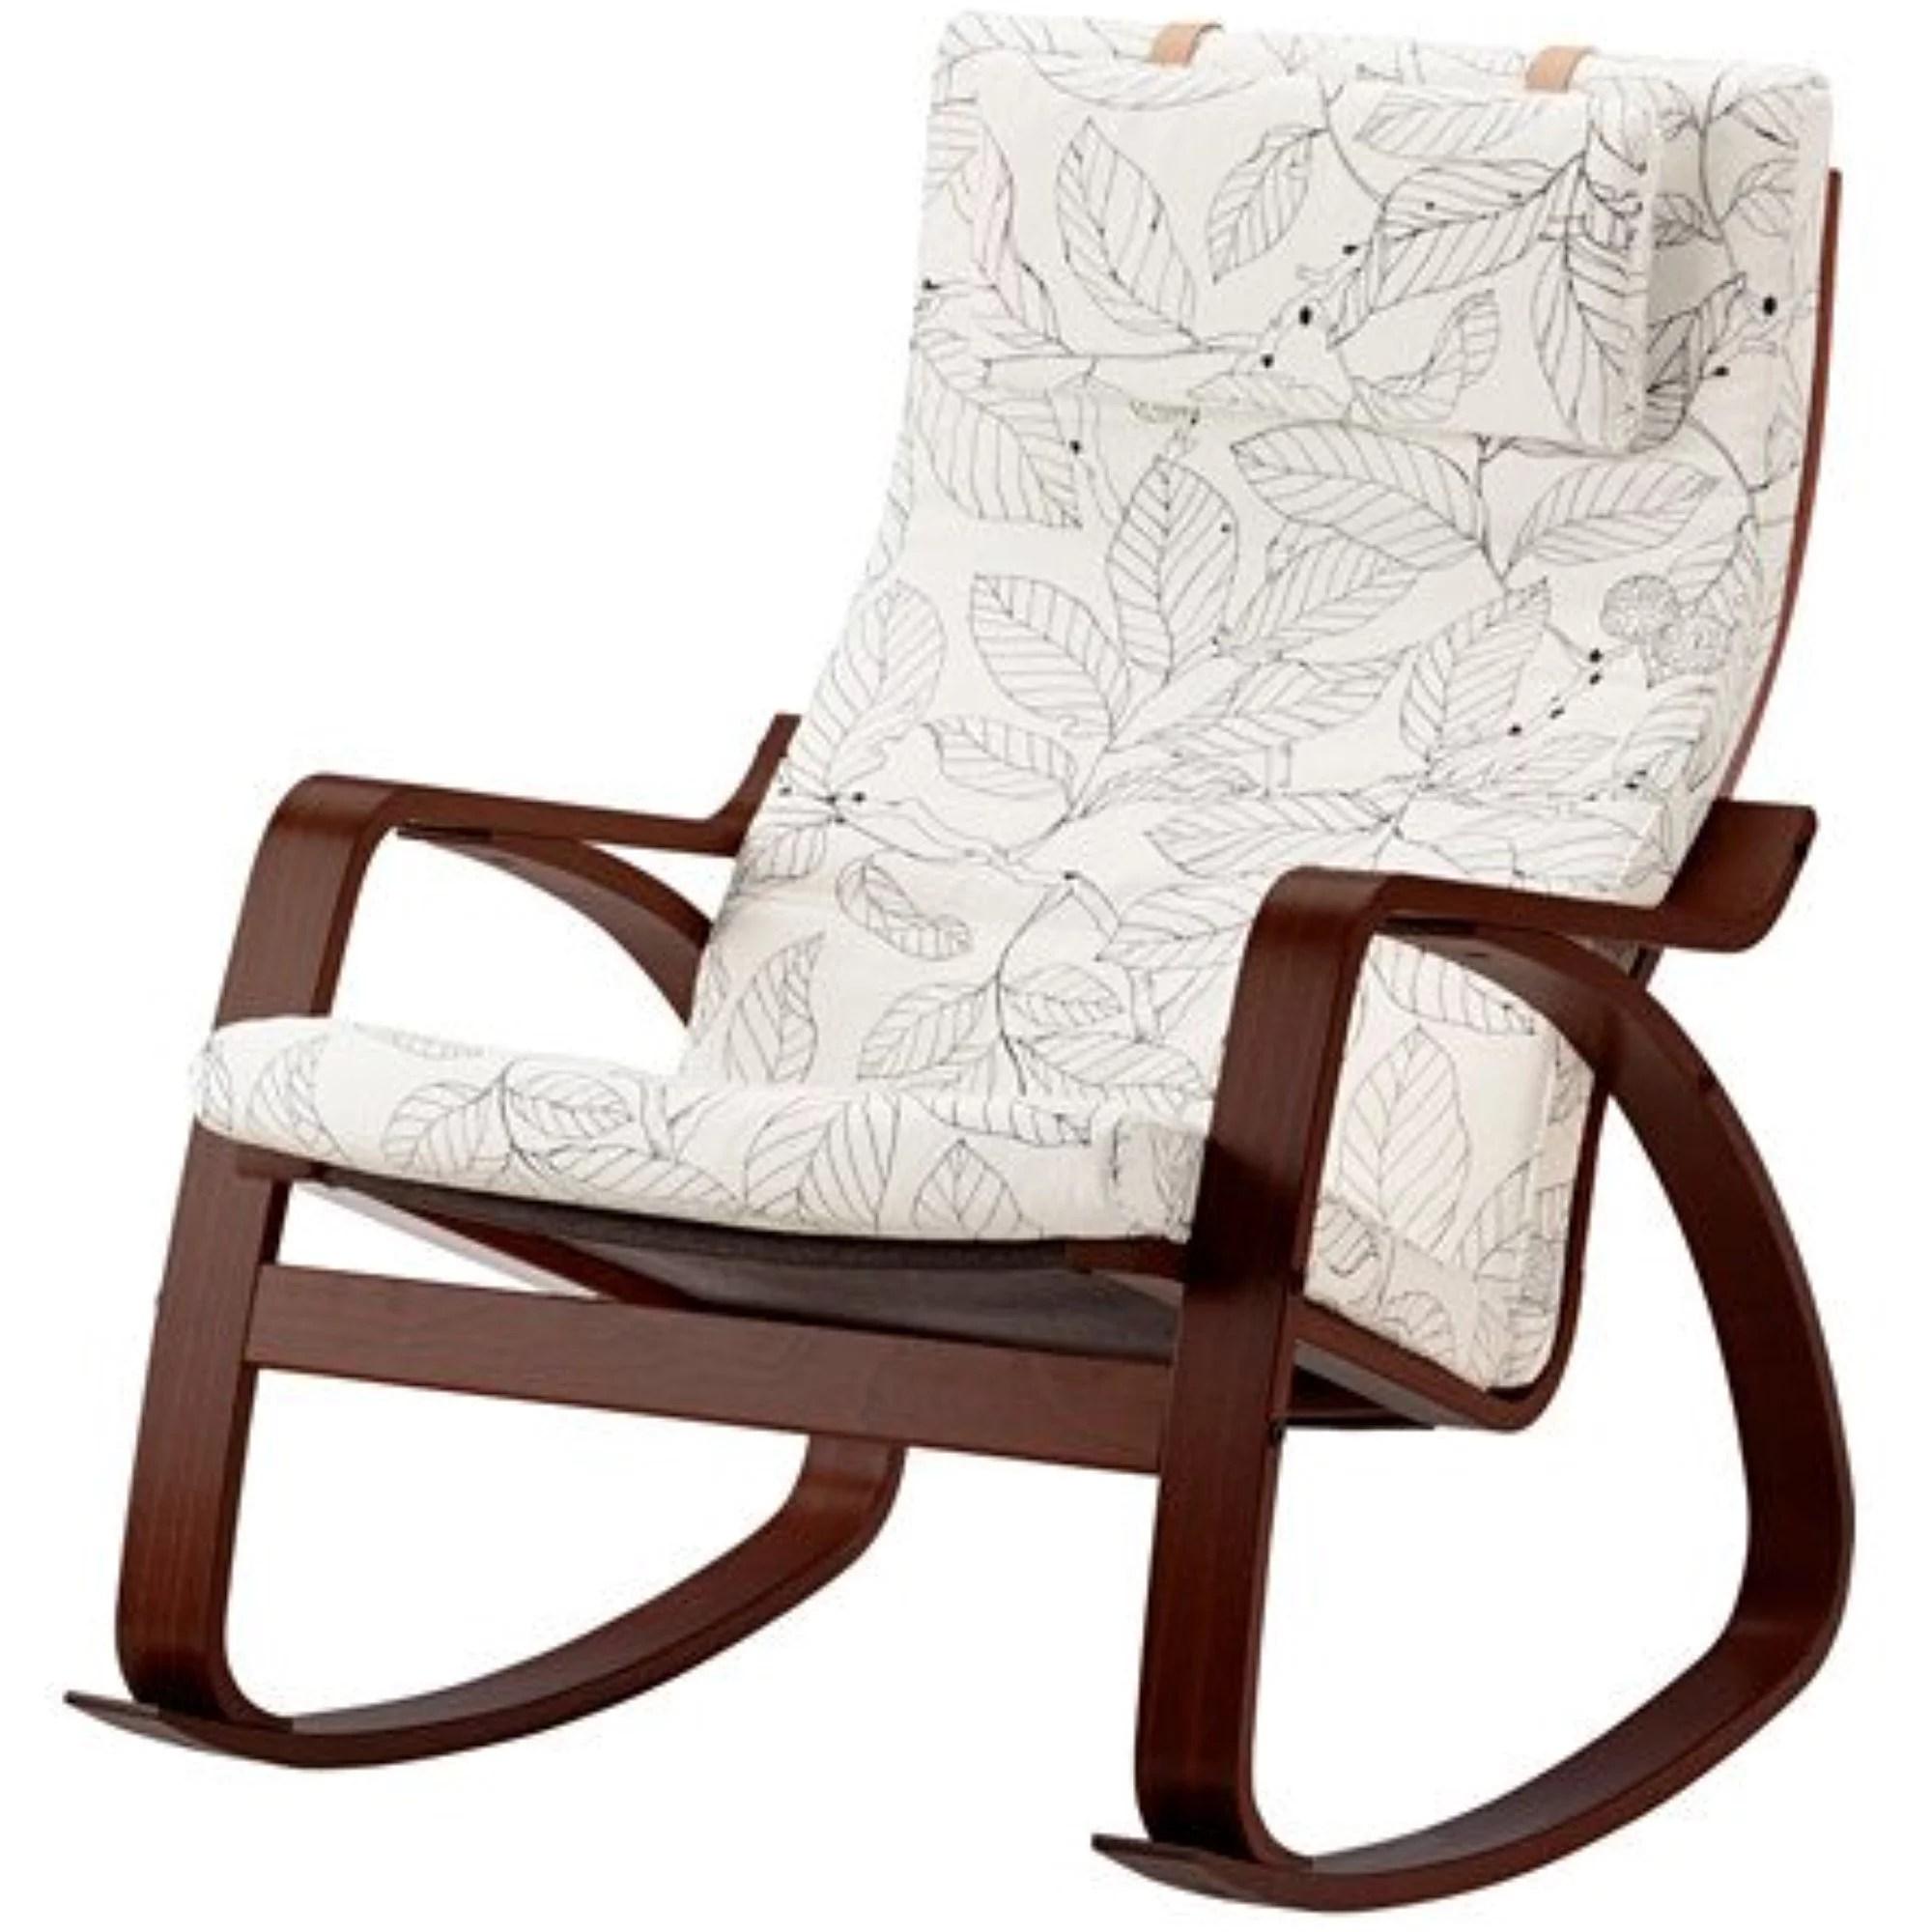 ikea rocking chairs best computer chair for back medium brown vislanda black white 20204 2658 306 walmart com